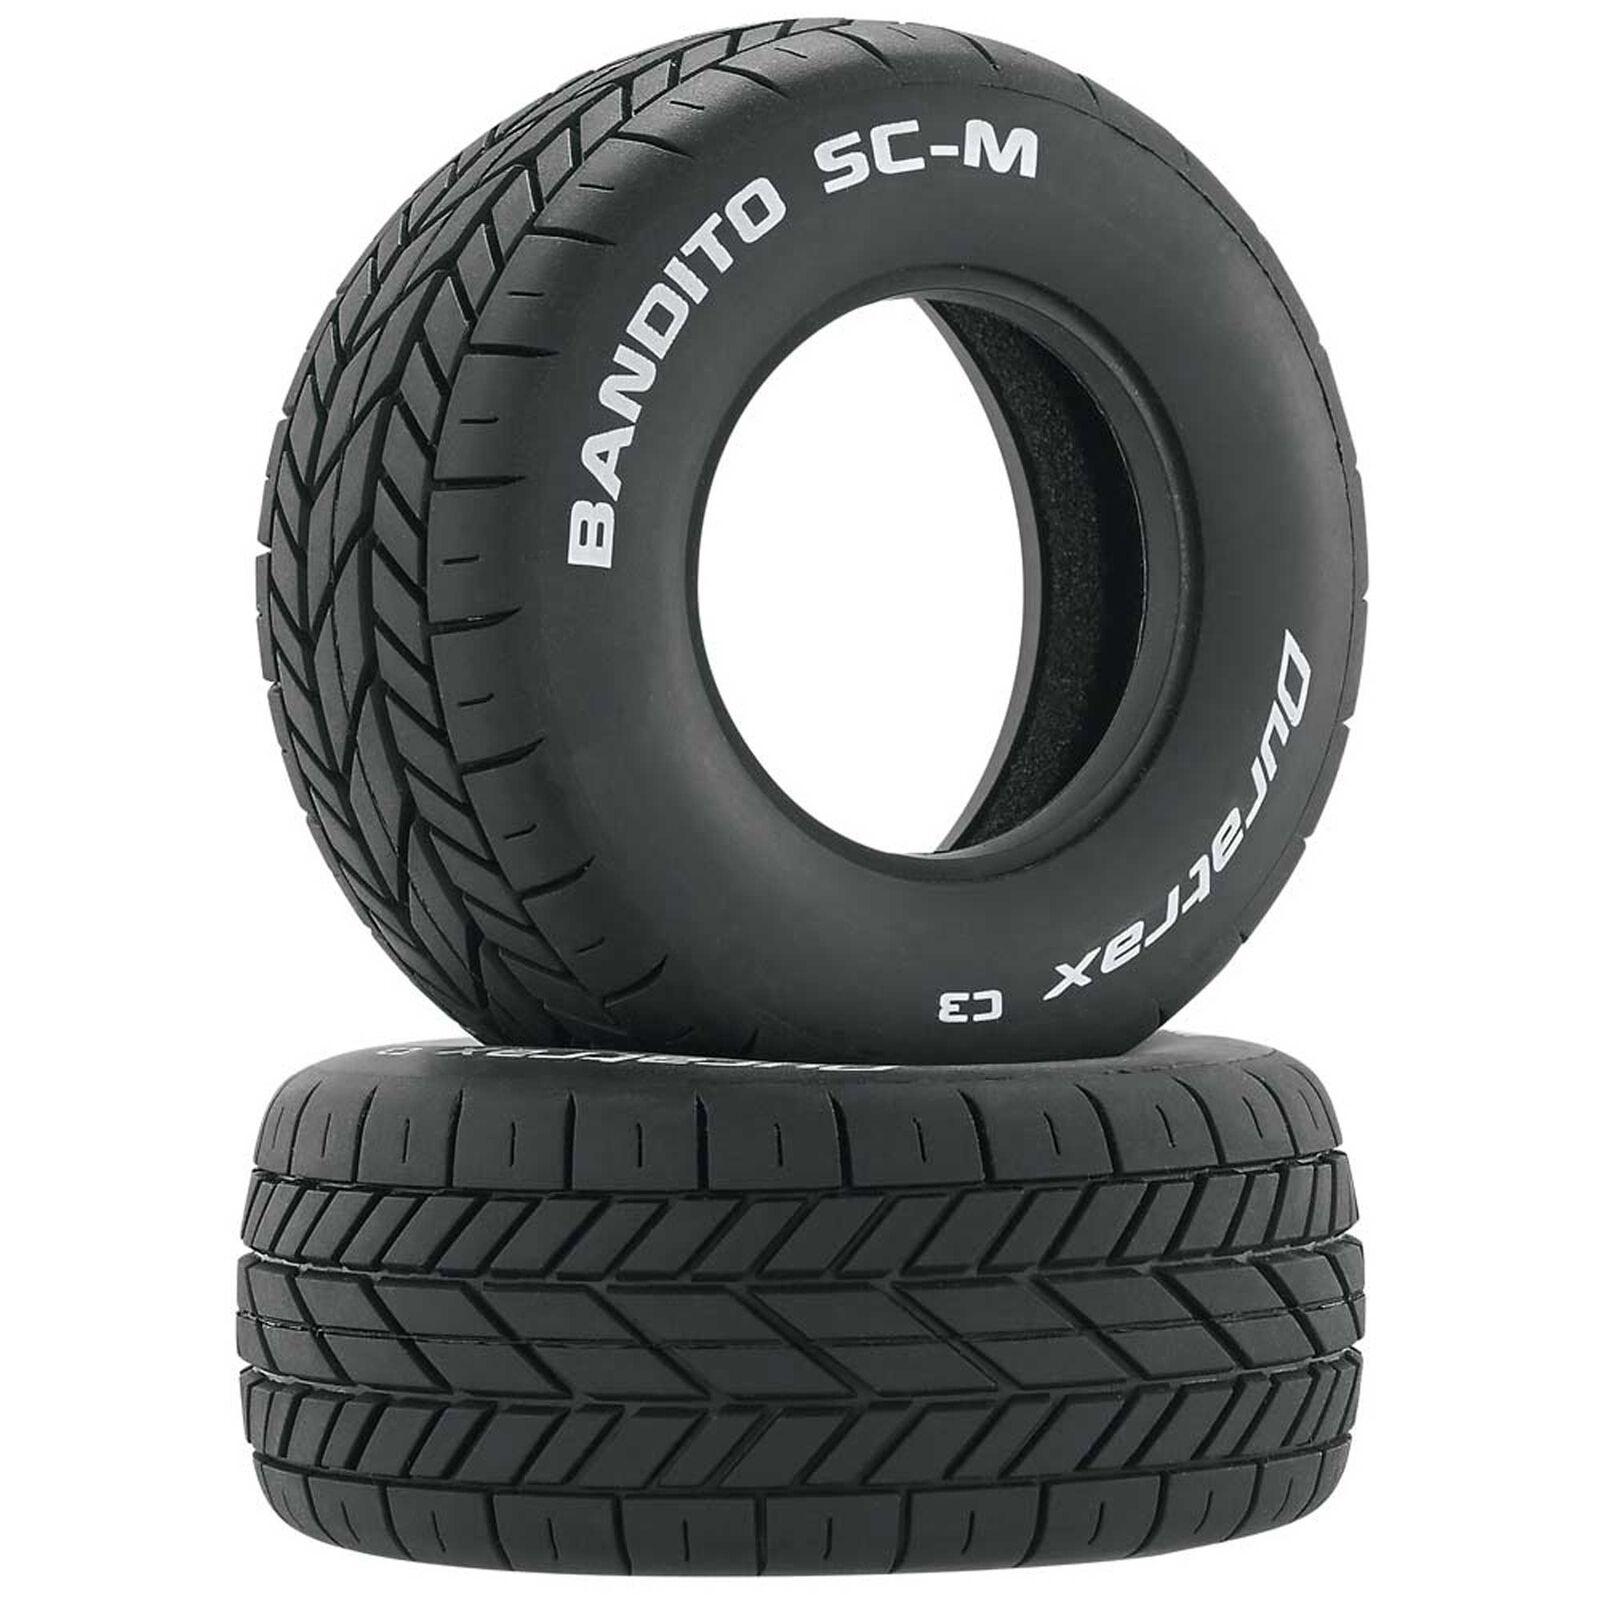 Bandito SC-M Oval Tires C3 (2)